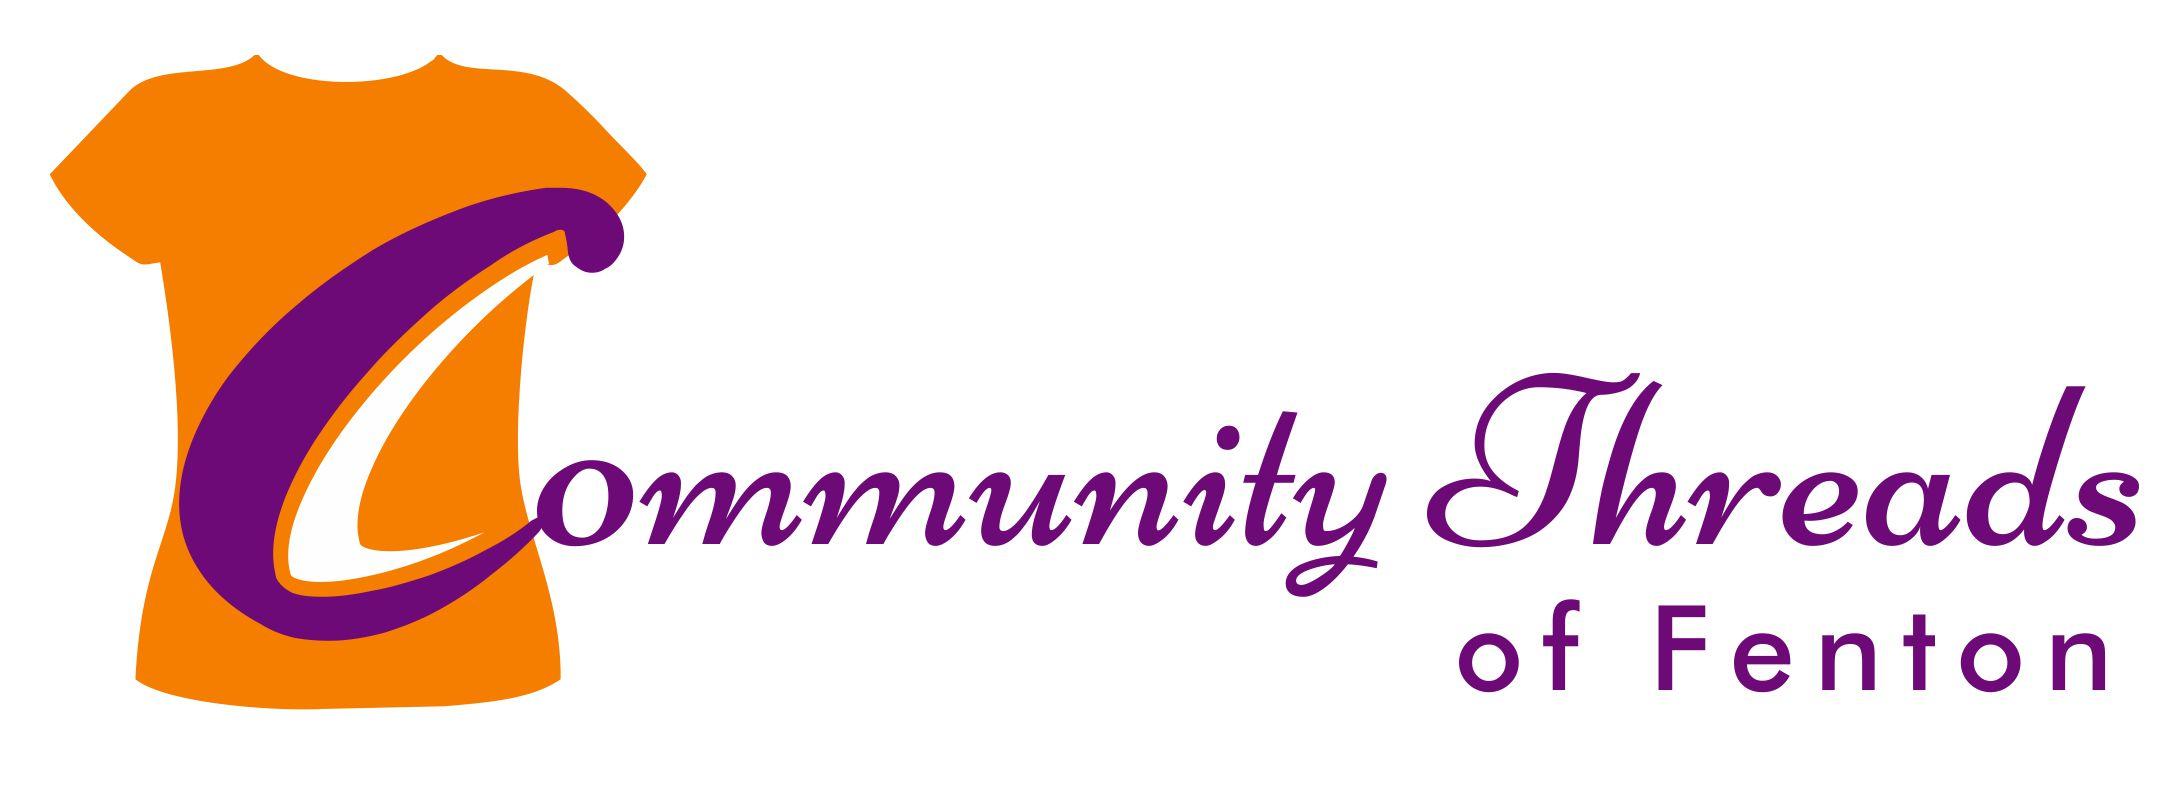 Community Threads of Fenton